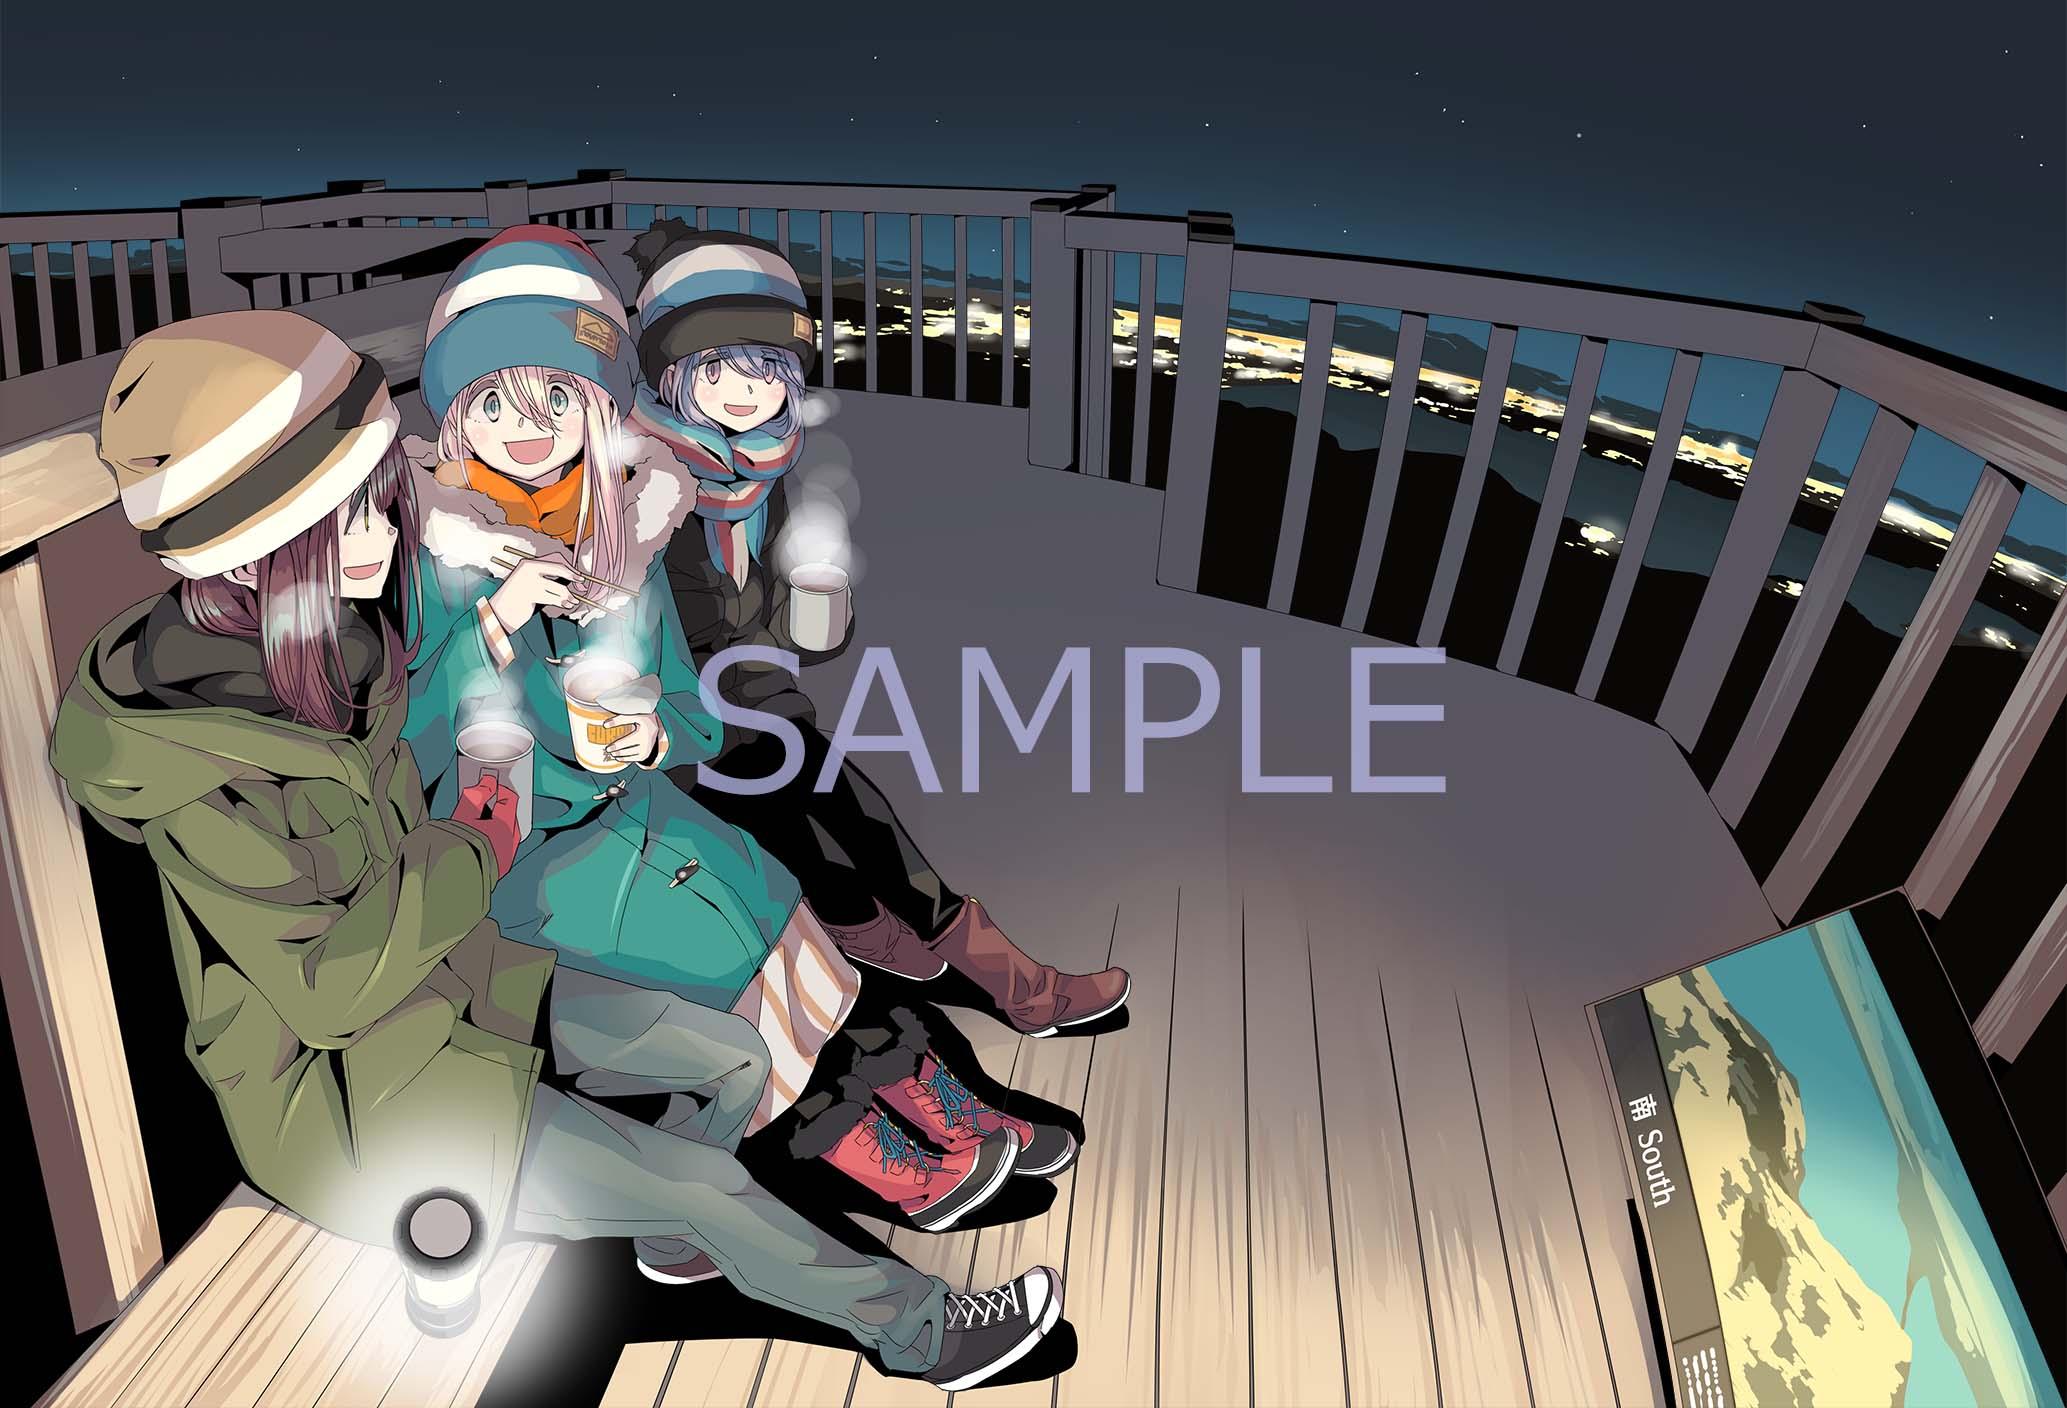 TVアニメ「ゆるキャン△SEASON2」Blu-ray&DVD全3巻発売決定!店舗別特典のデザイン画像も解禁